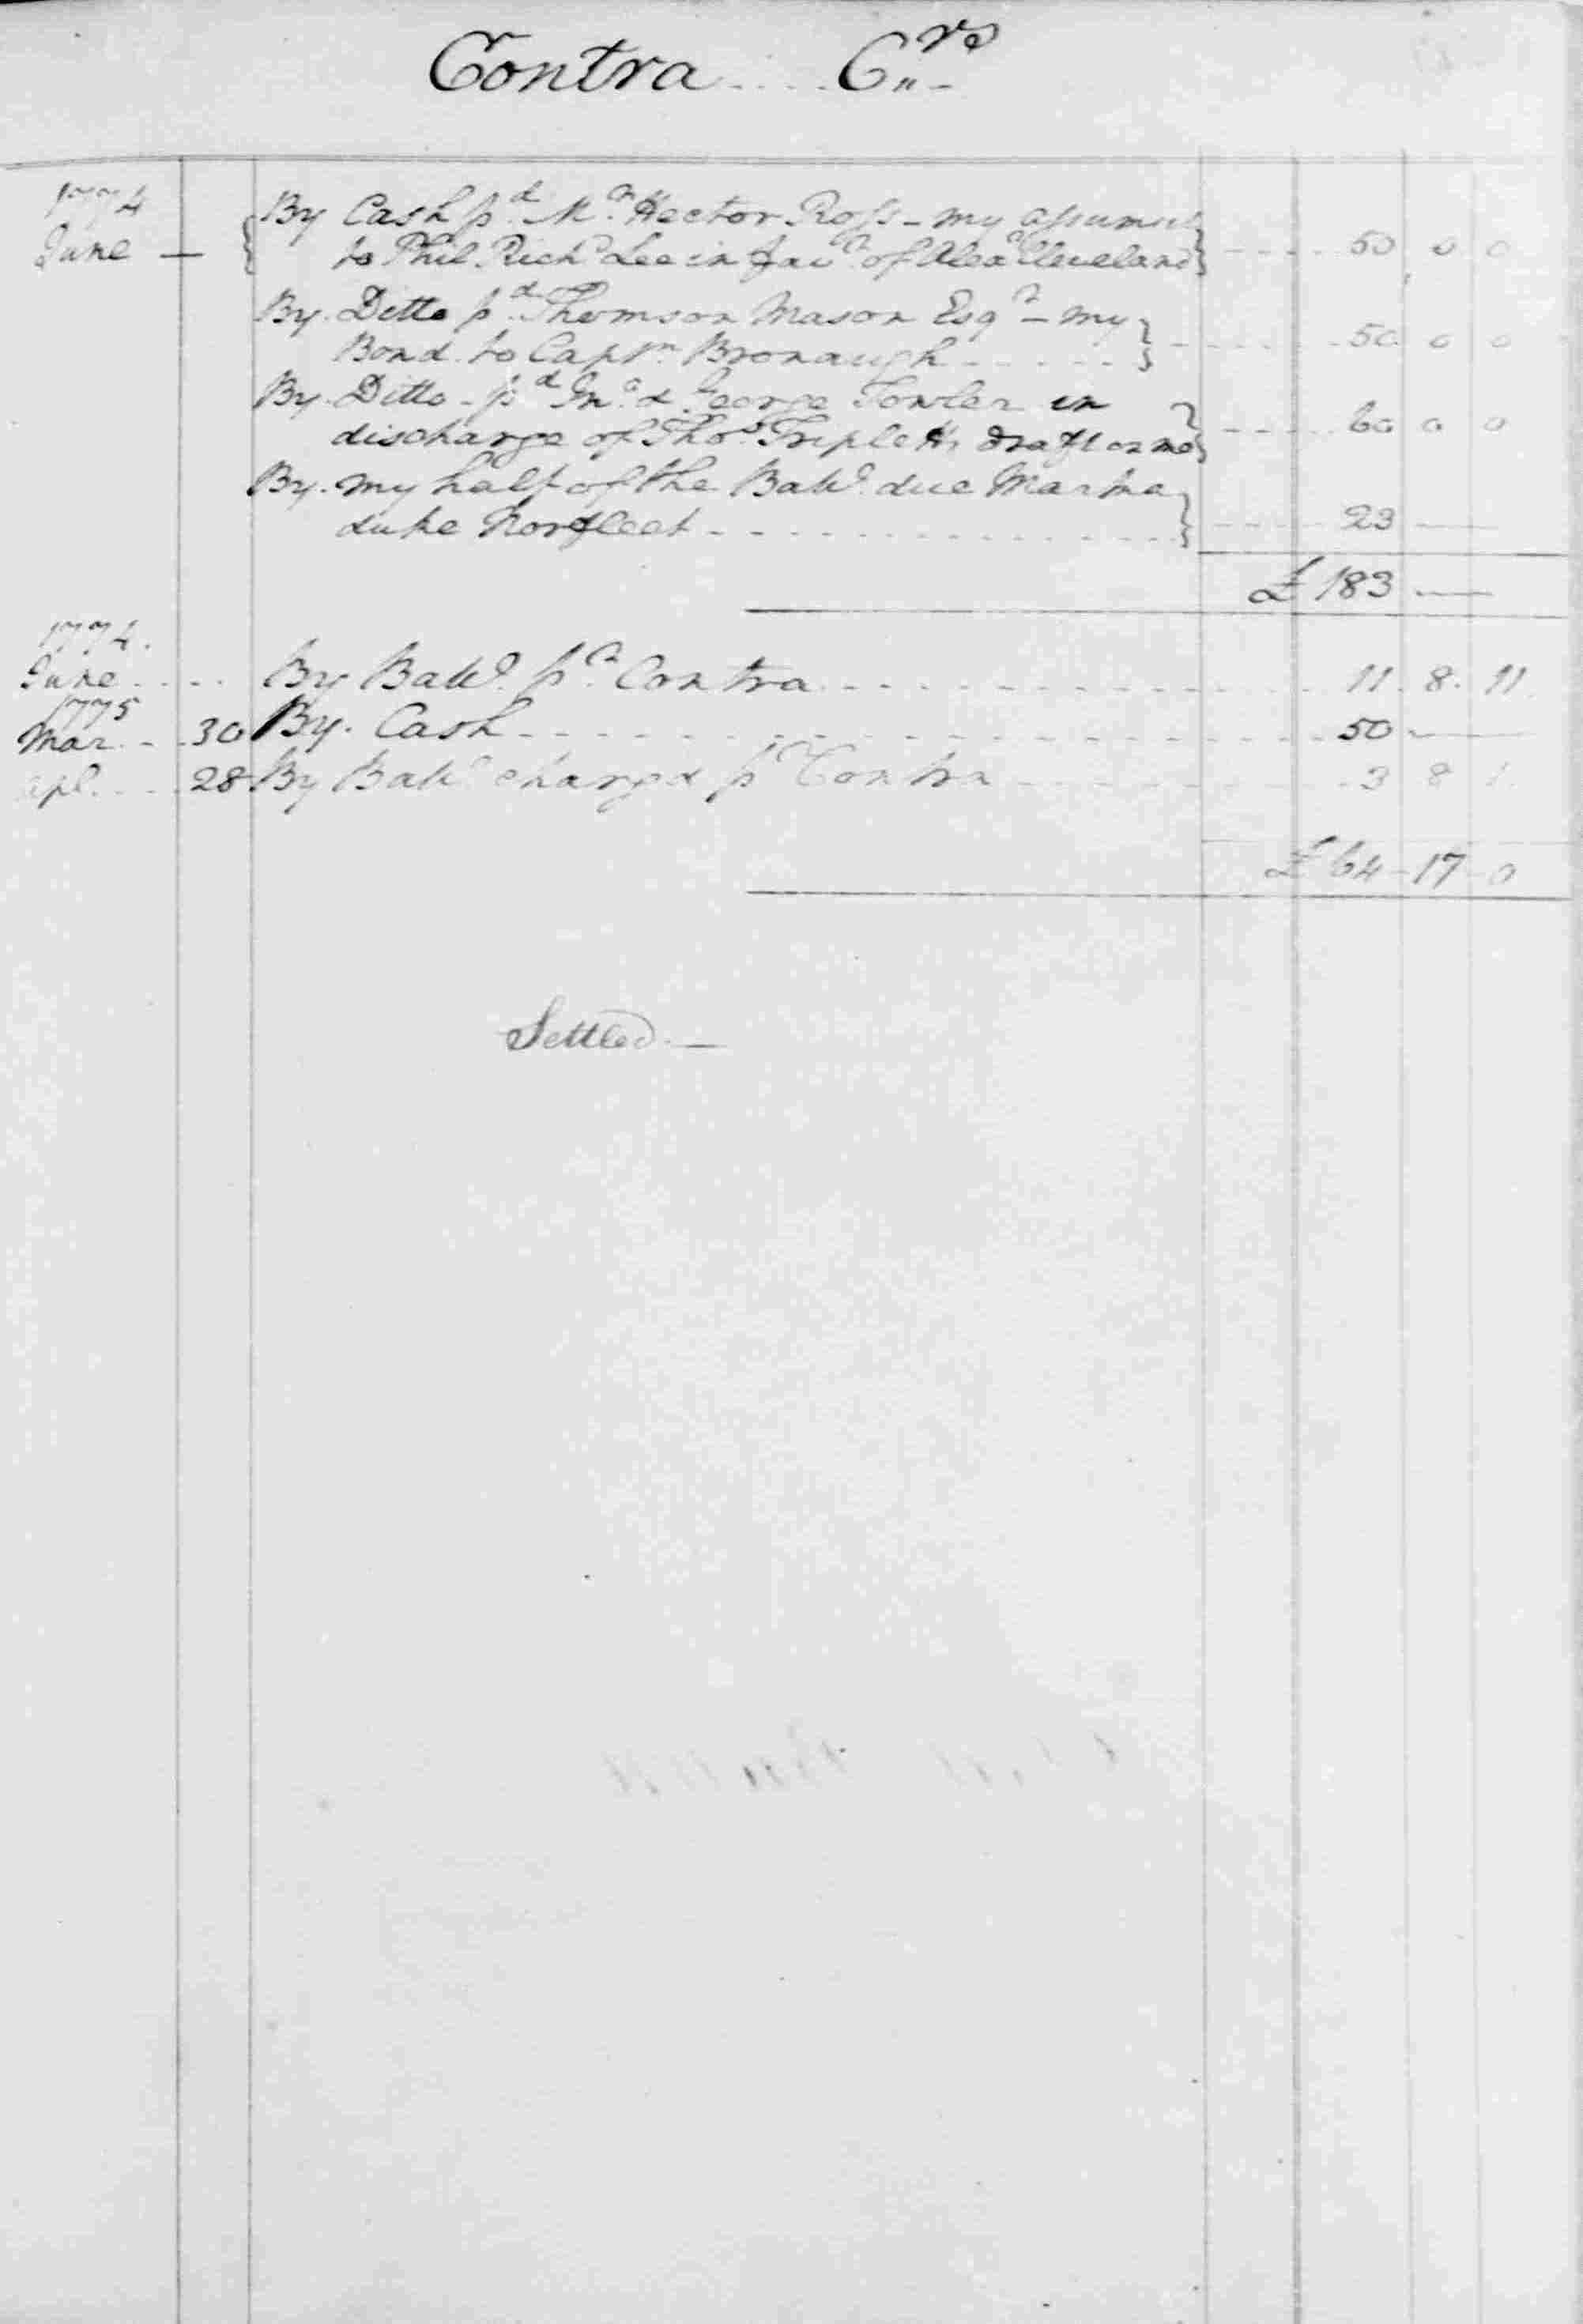 Ledger B, folio 118, right side